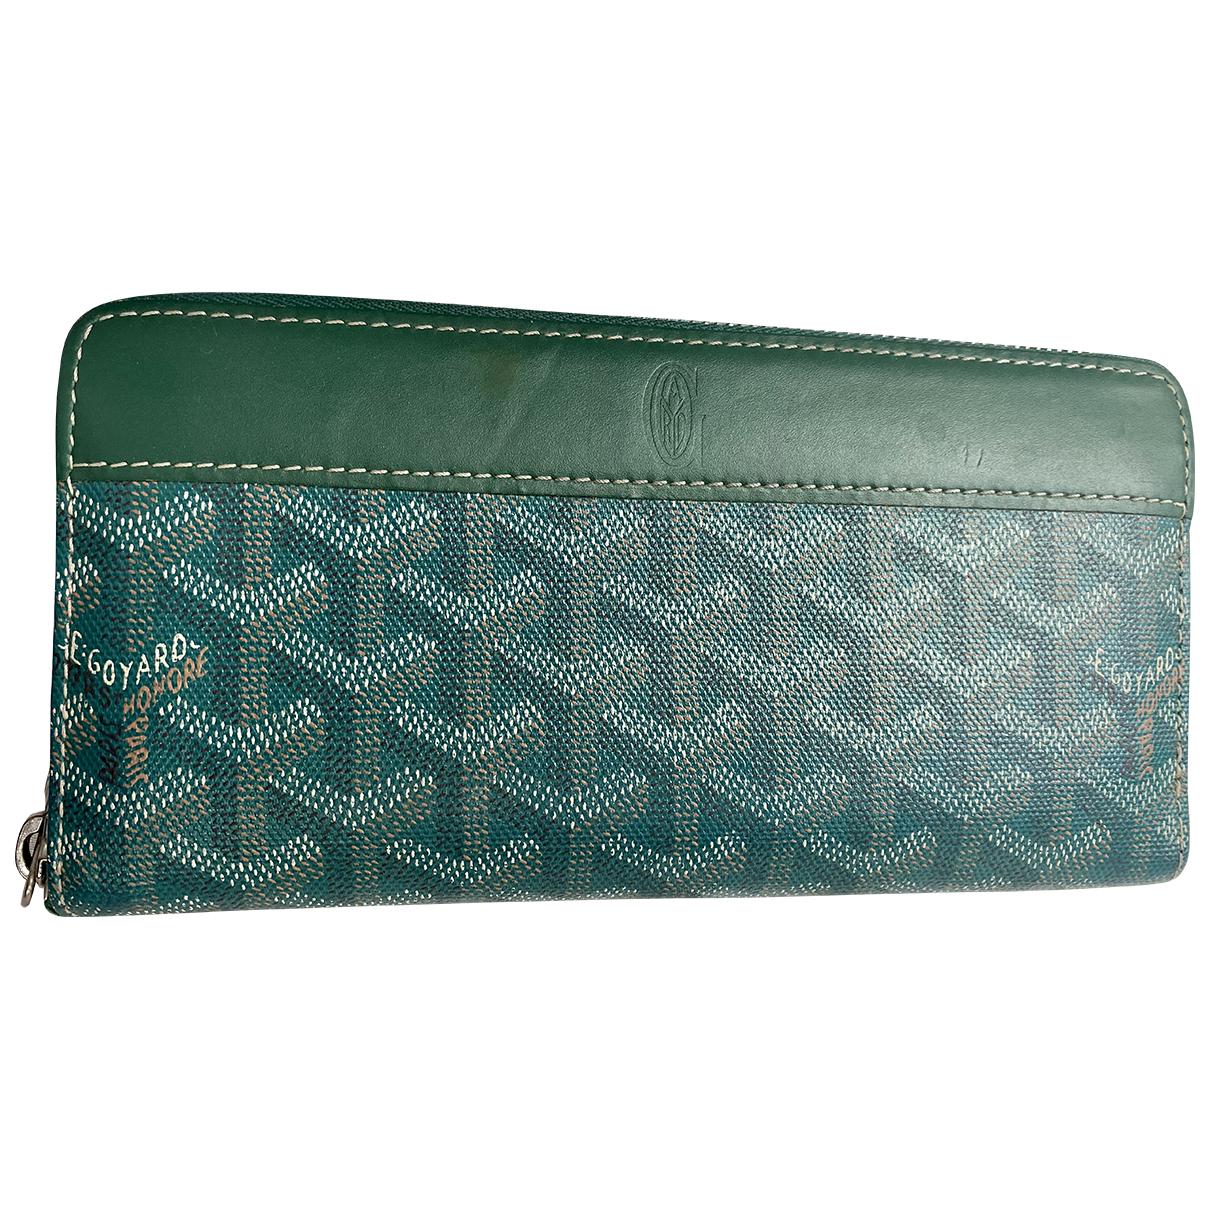 Goyard - Portefeuille Matignon pour femme en toile - vert